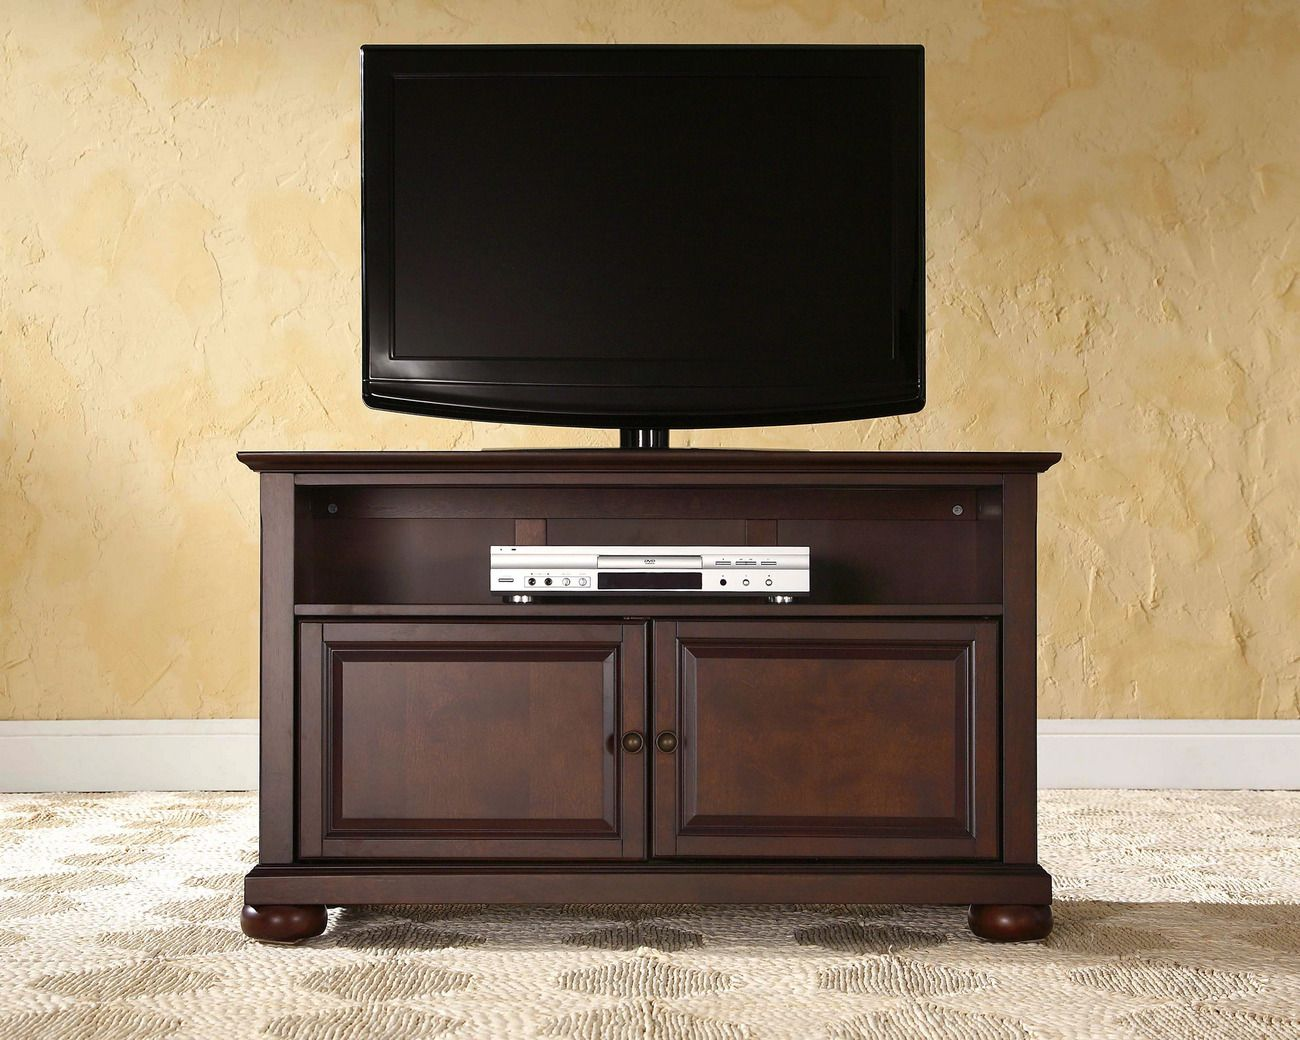 alexandria 42 tv stand in vintage mahogany finish crosley kf10003ama